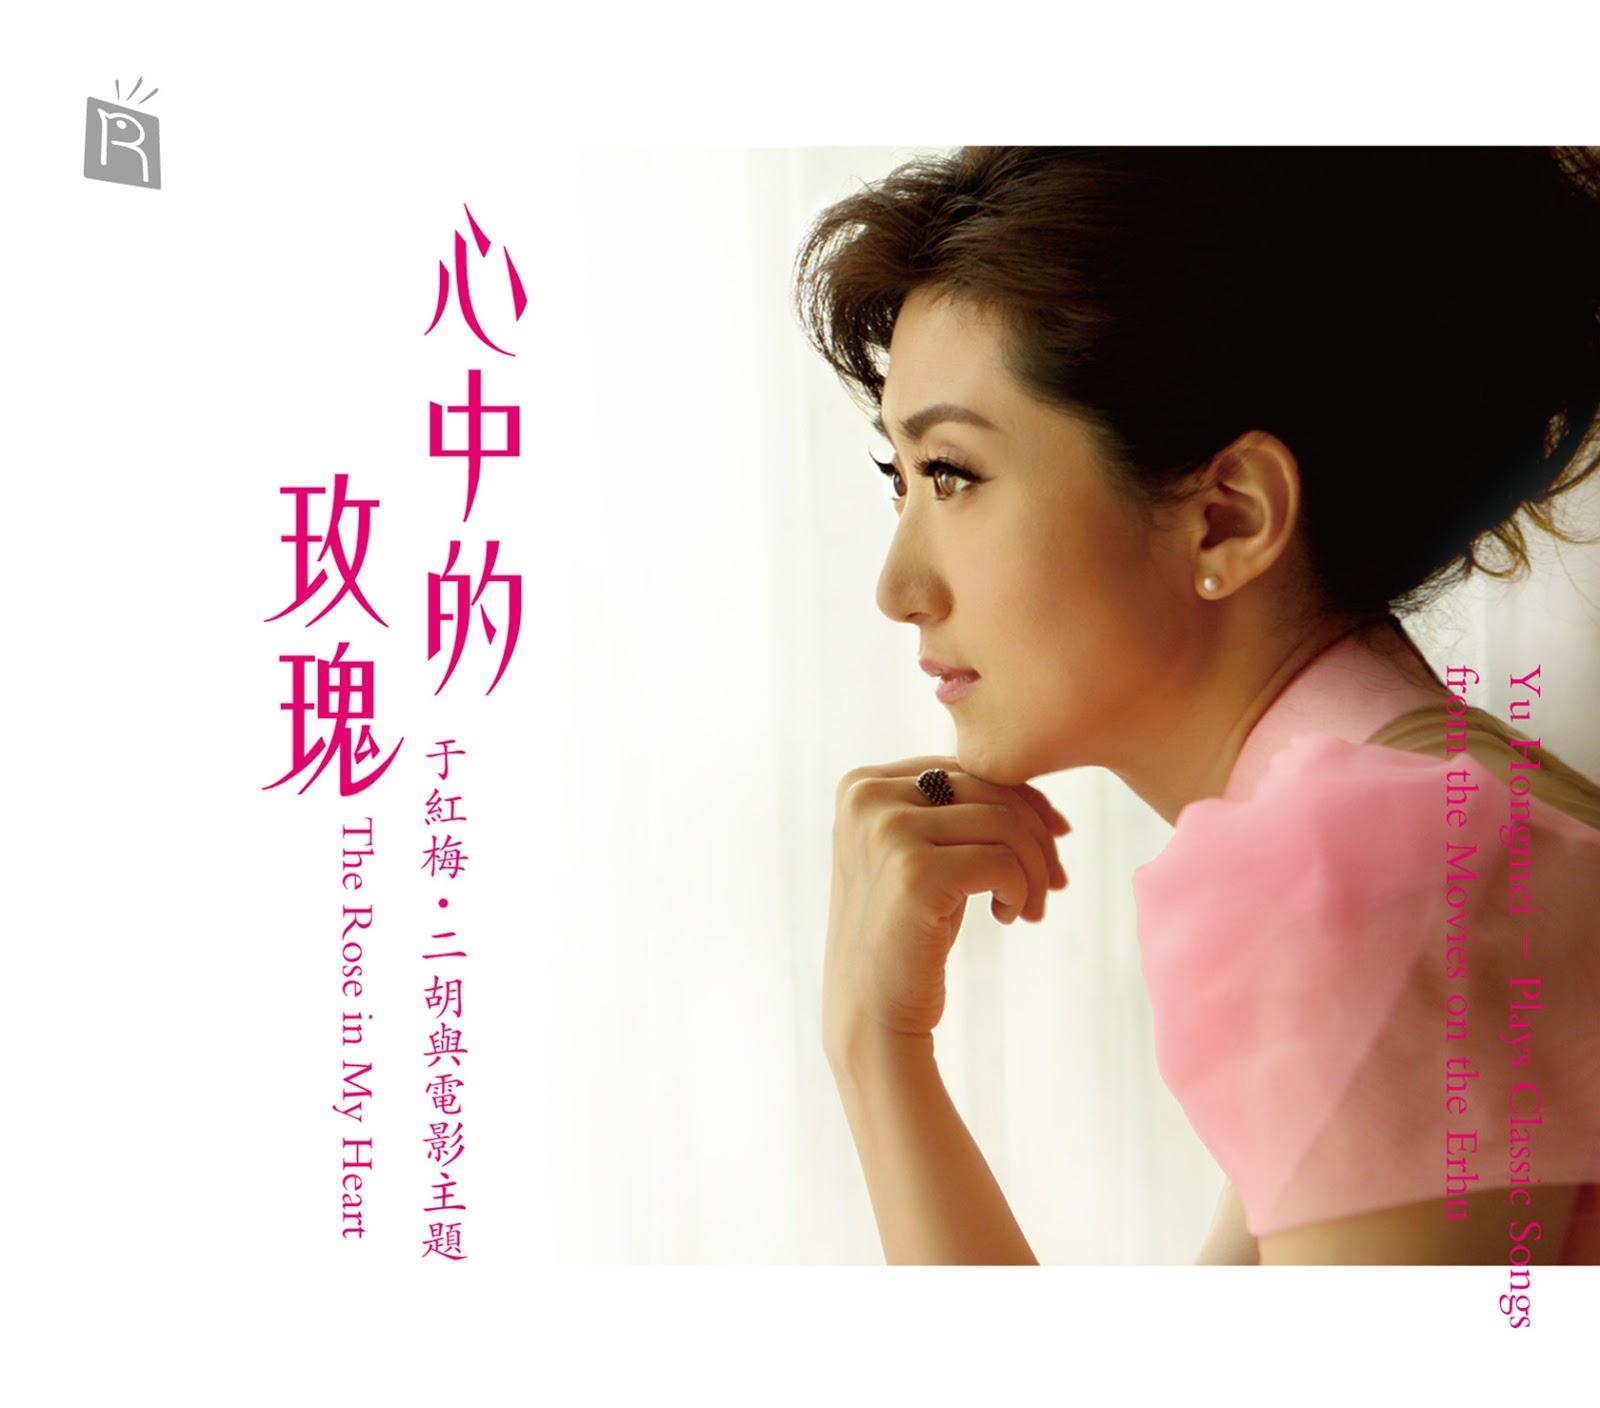 [Erhu/Folk] Yu Hong-mei (于紅梅) - The Rose In My Heart (心中的玫瑰) (2011) [WAV] ~ Relaxing World